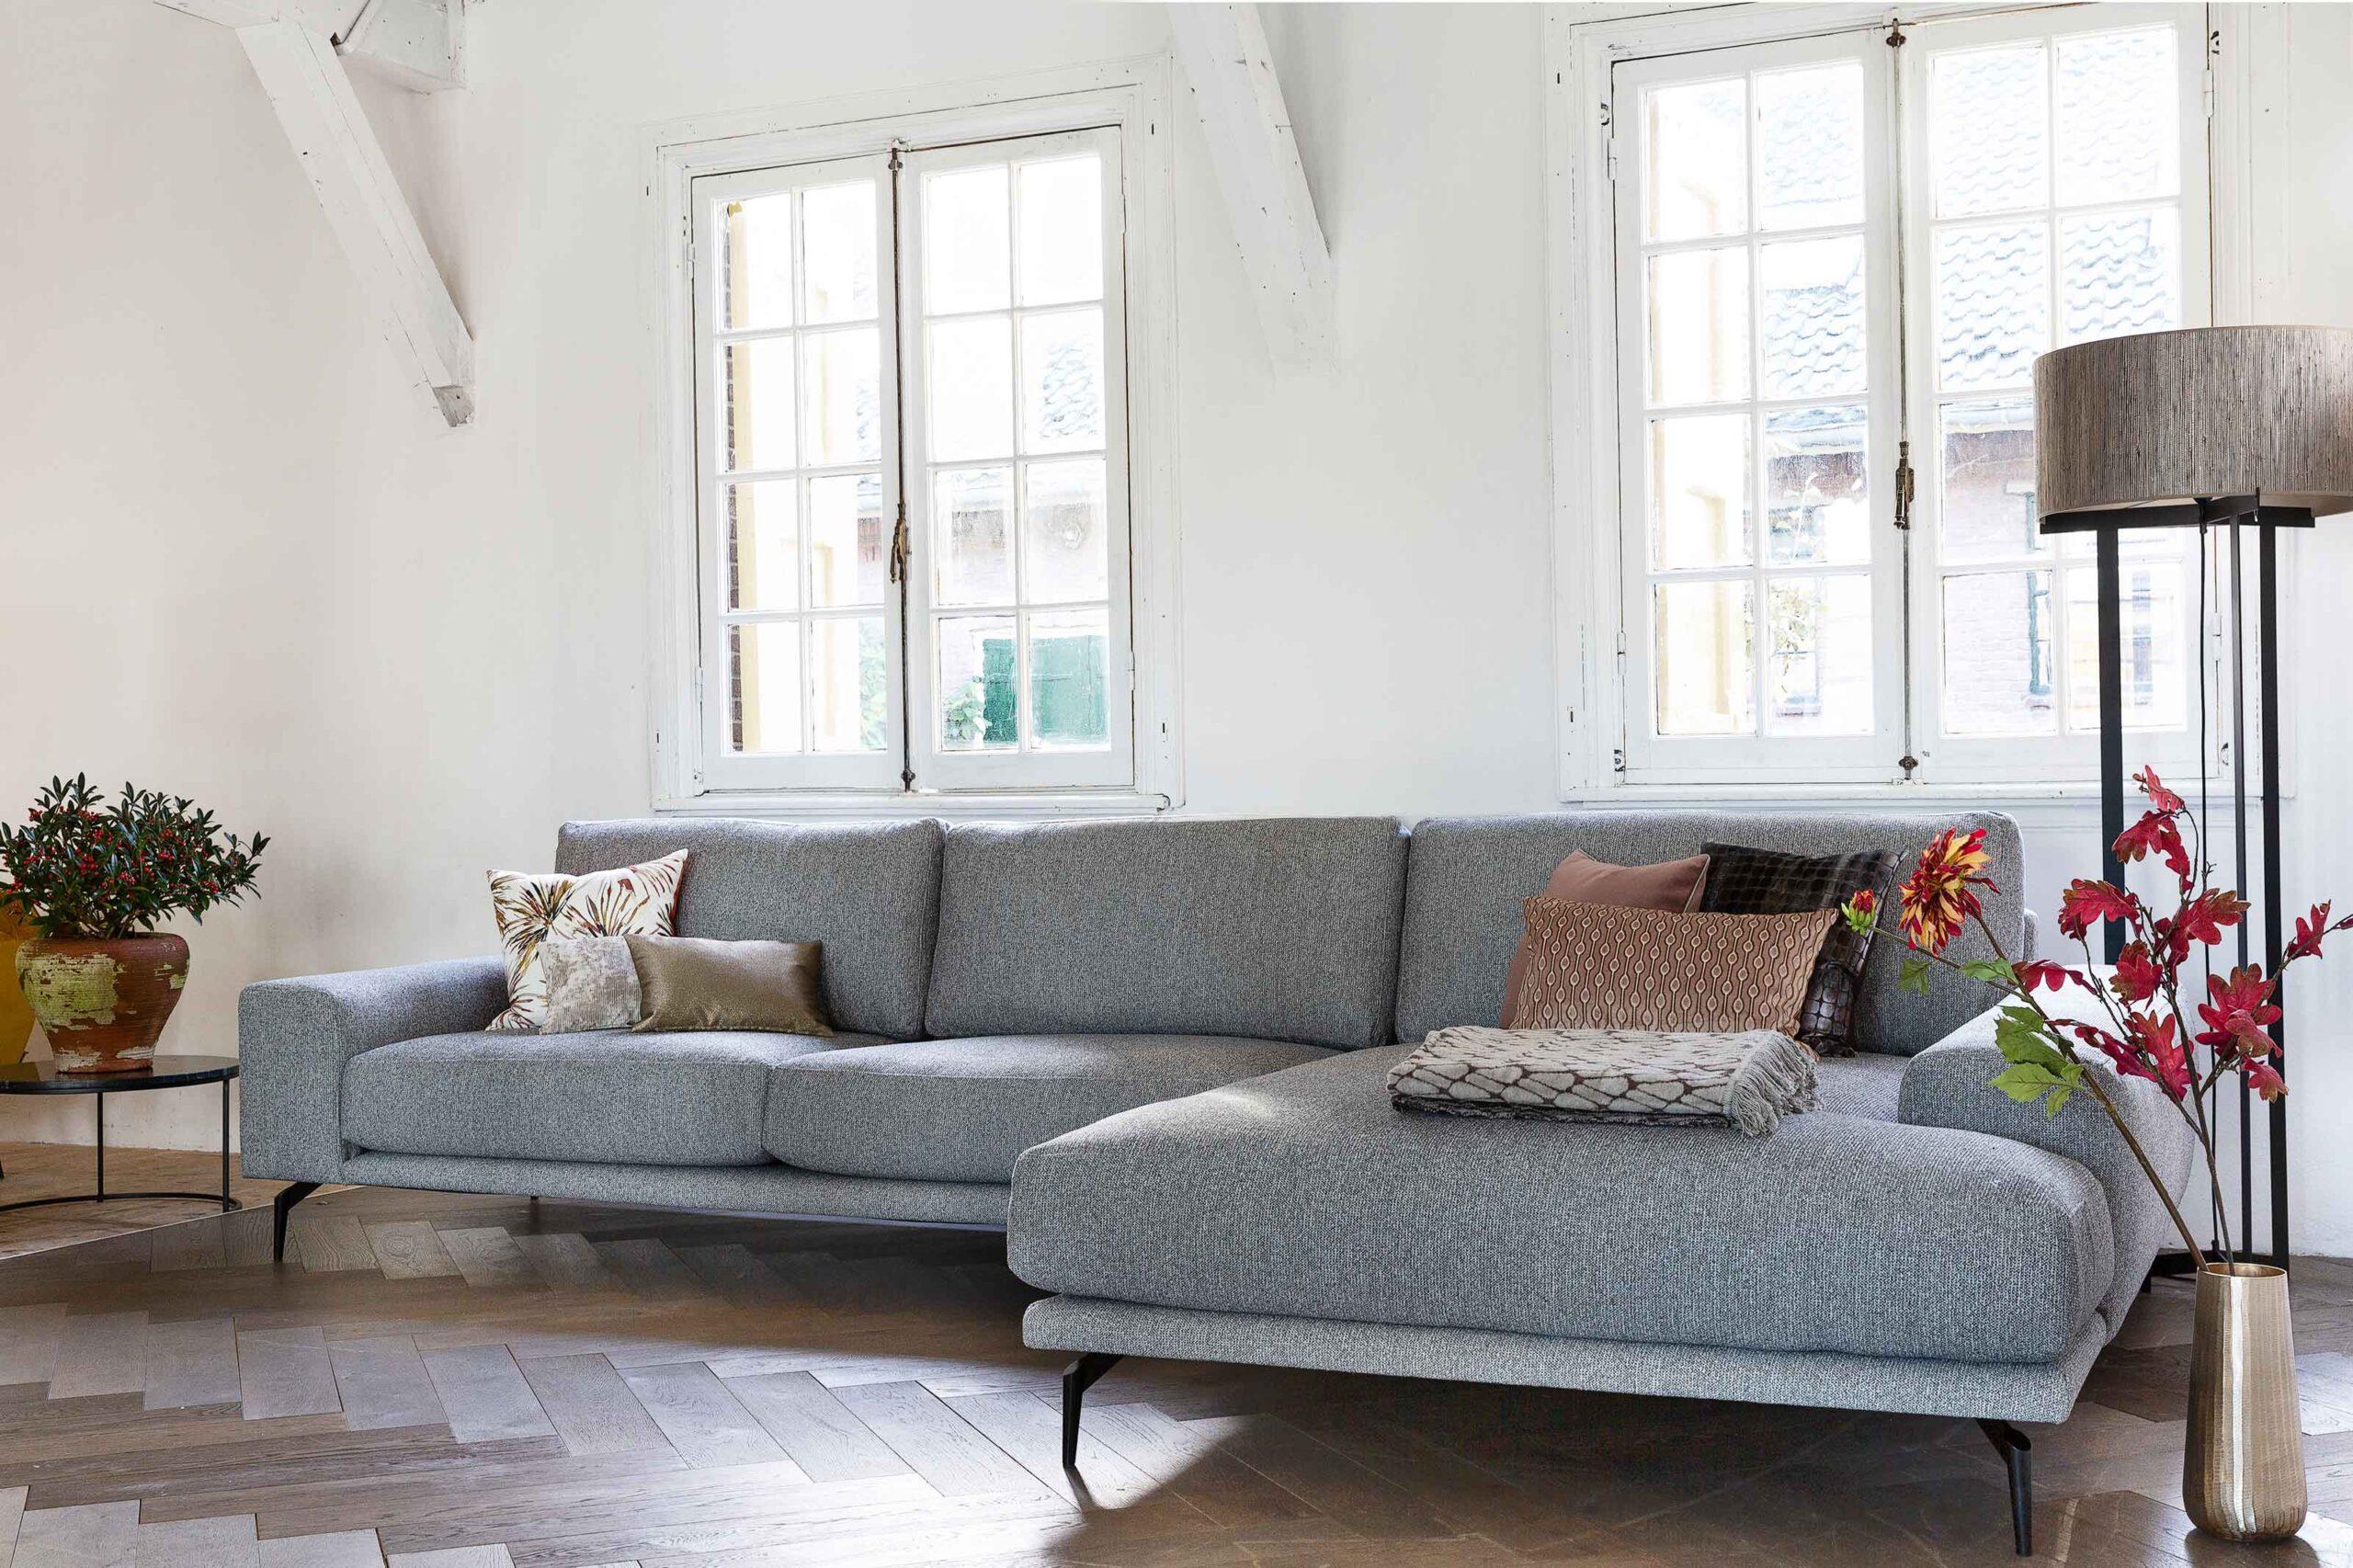 bella-milano-moderne-hoekbank-op-hoge-poten-soofs-interieur